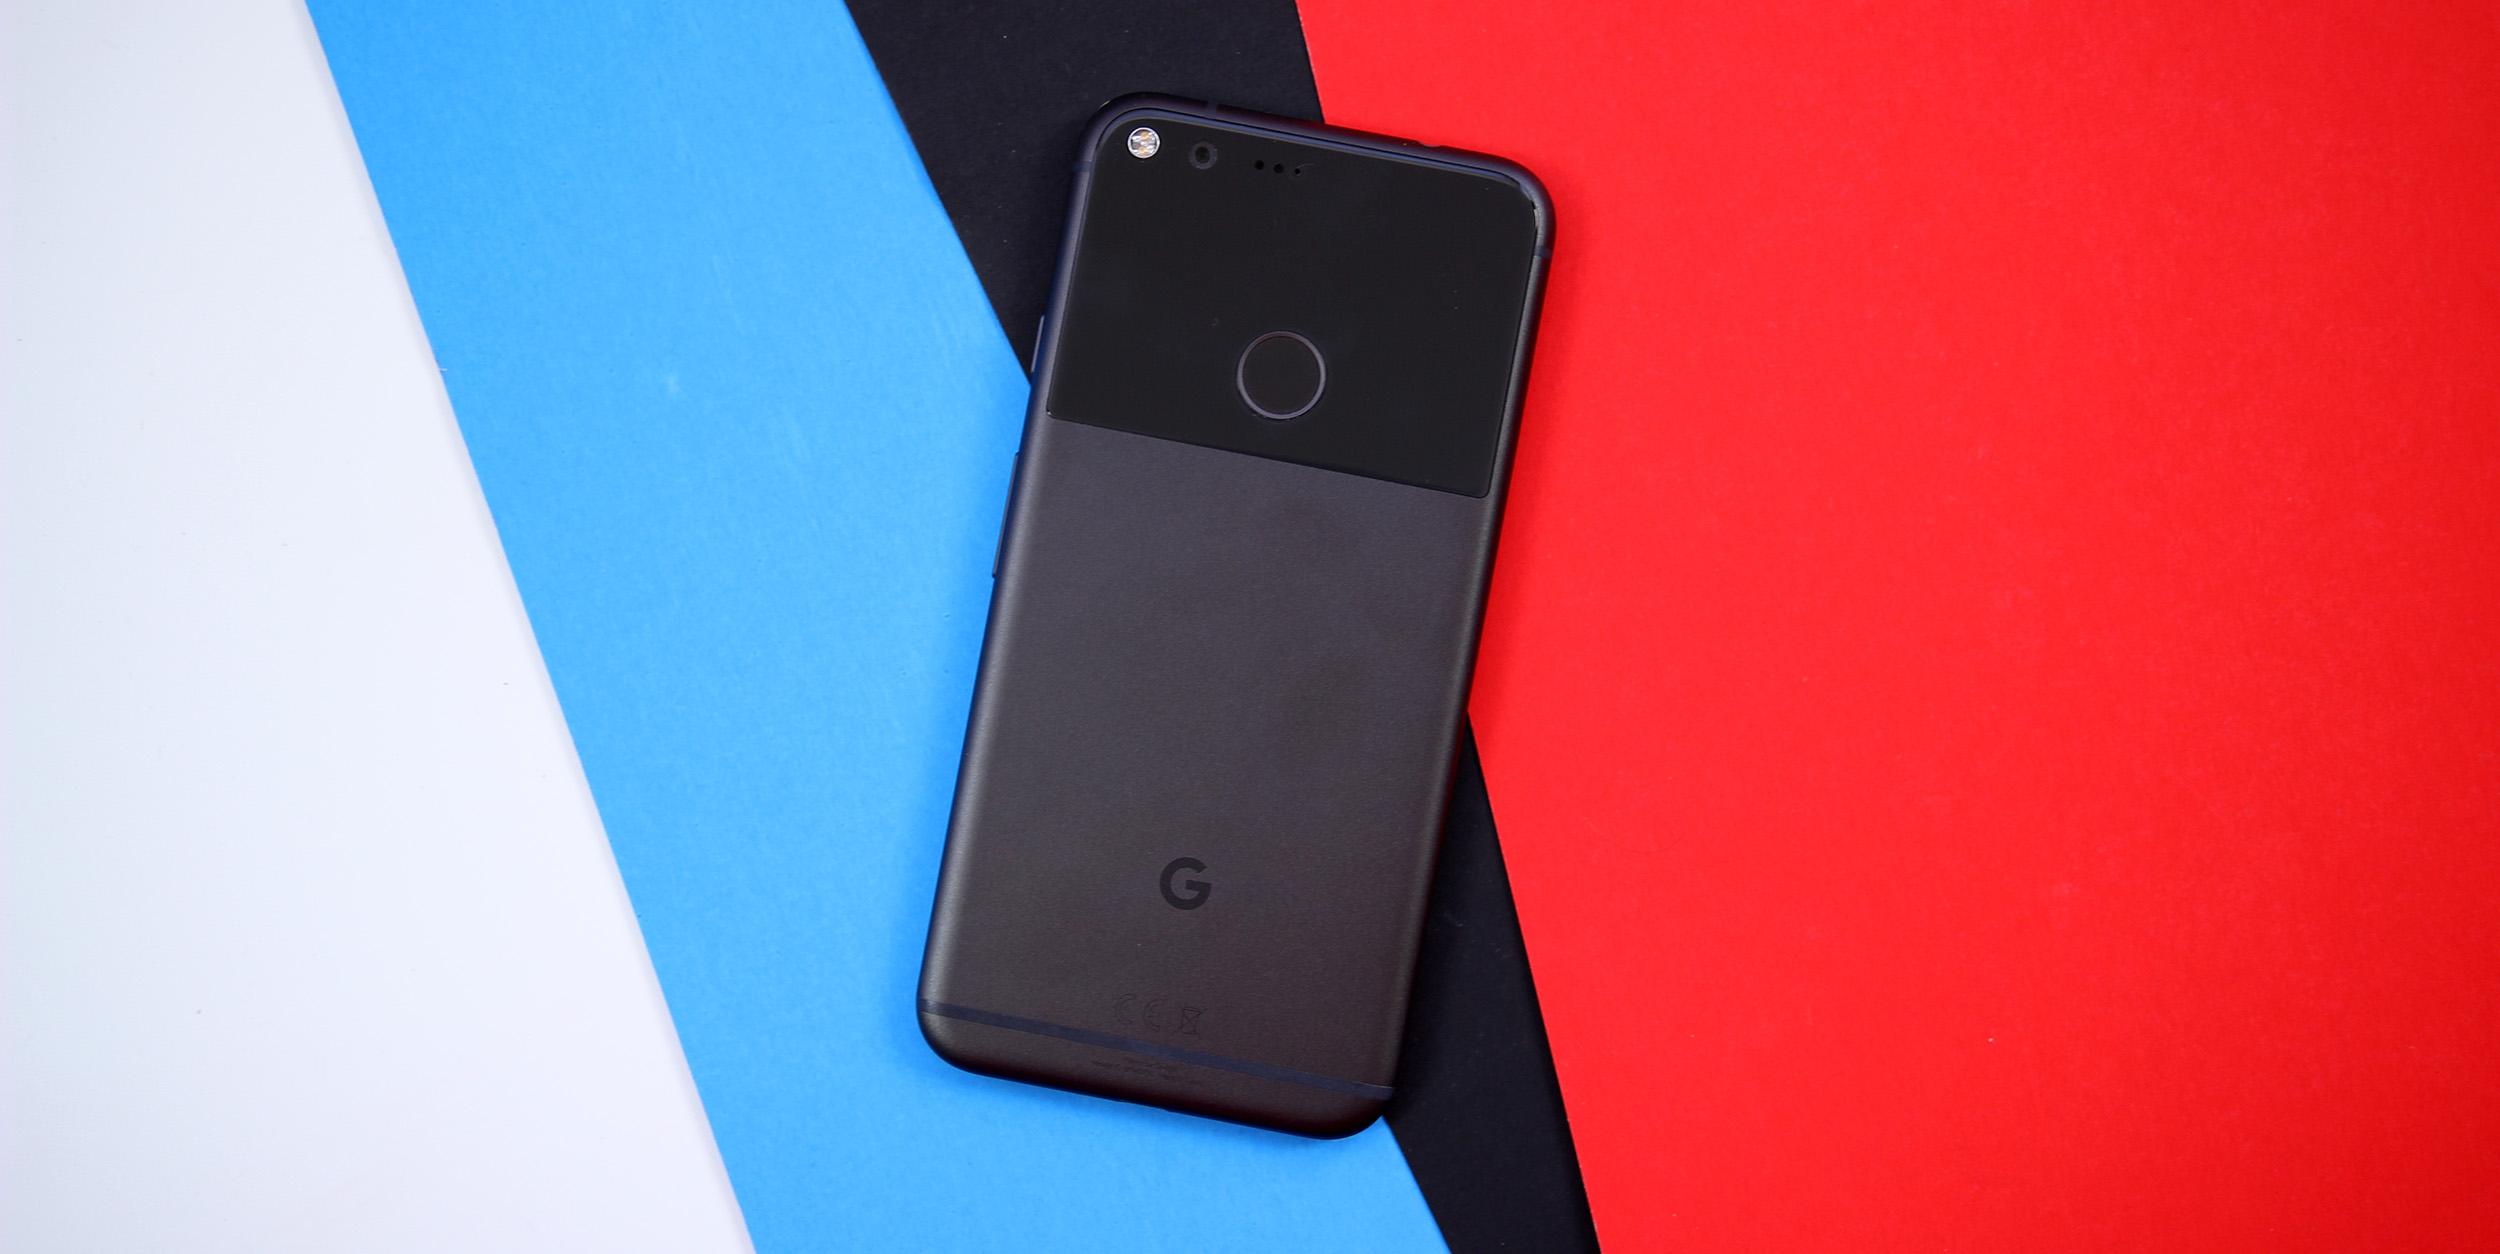 Google Pixel and Pixel XL now part of LineageOS 16 nightlies program